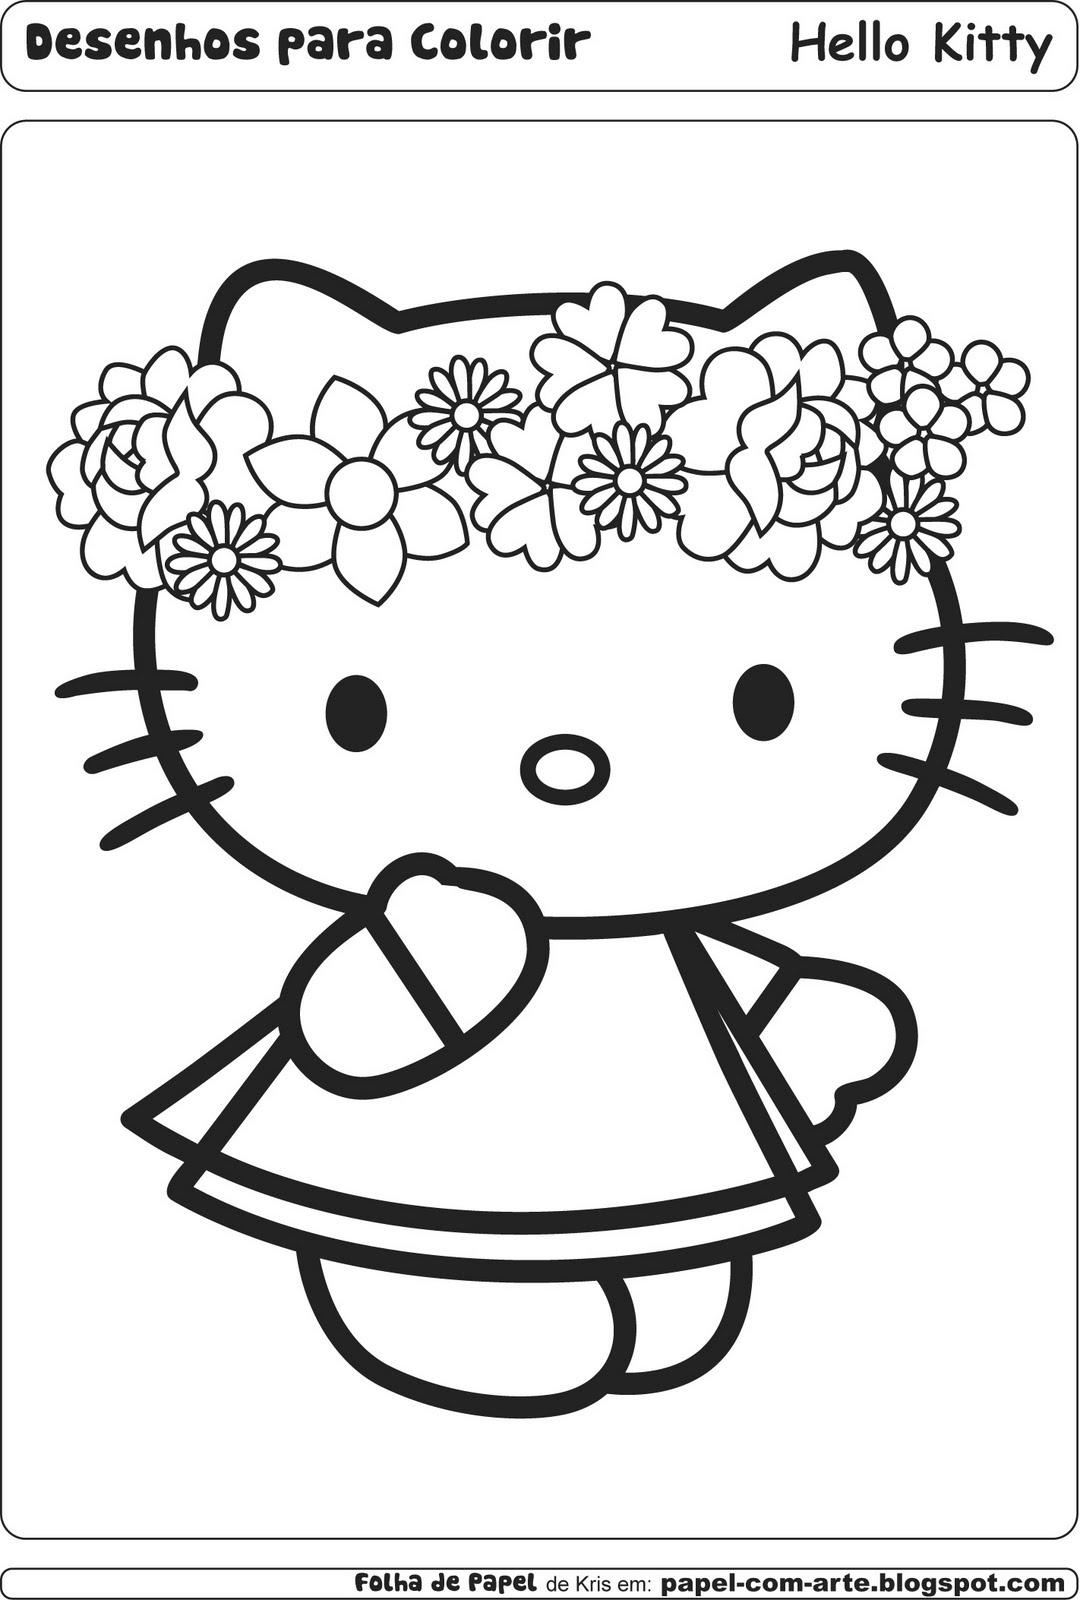 Imagens Da Hello Kitty Para Imprimir